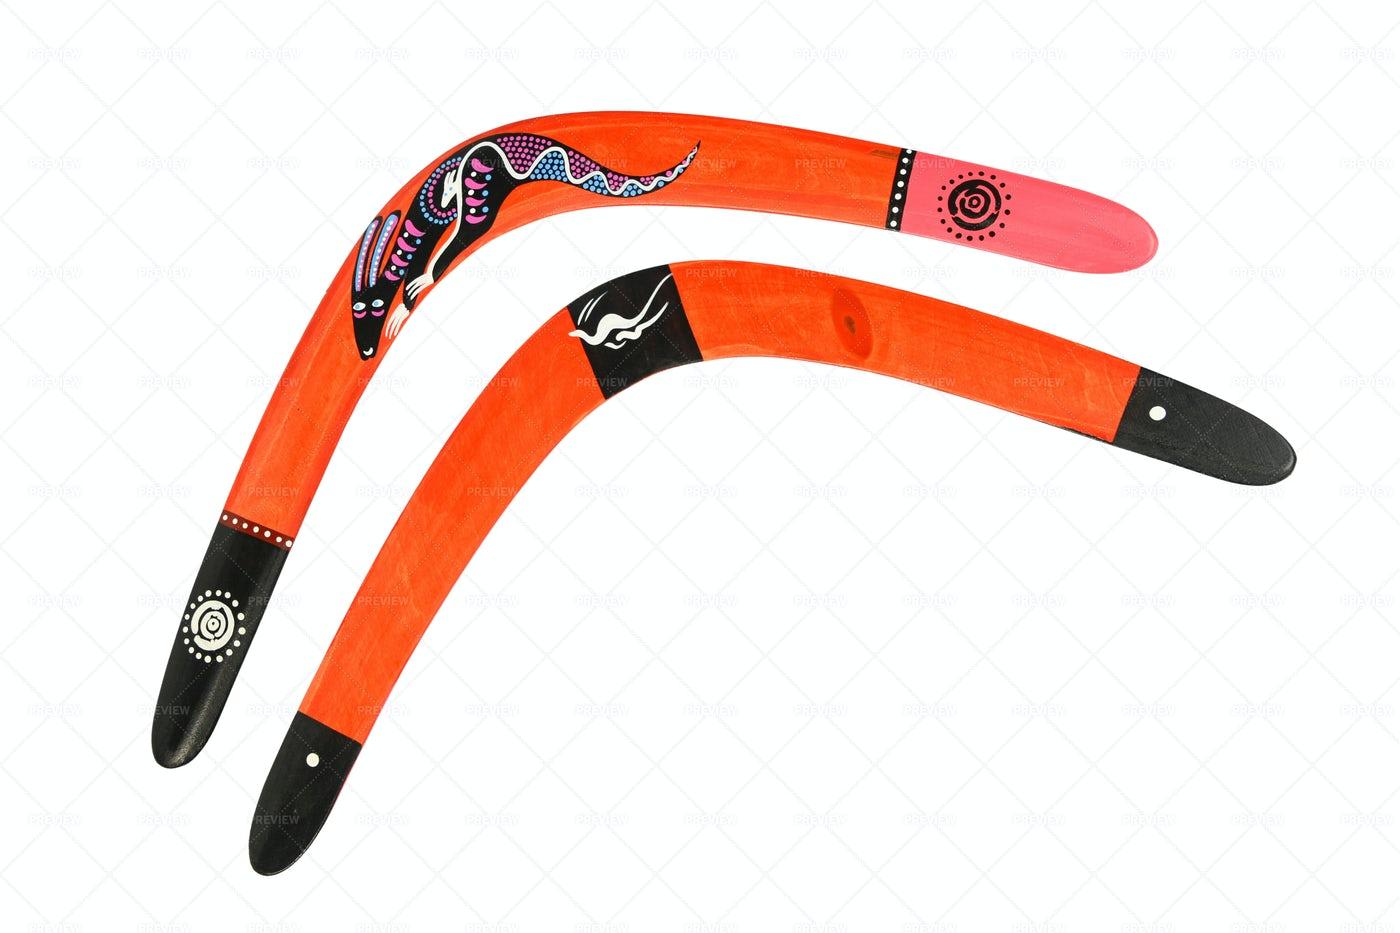 Two Wooden Boomerangs: Stock Photos